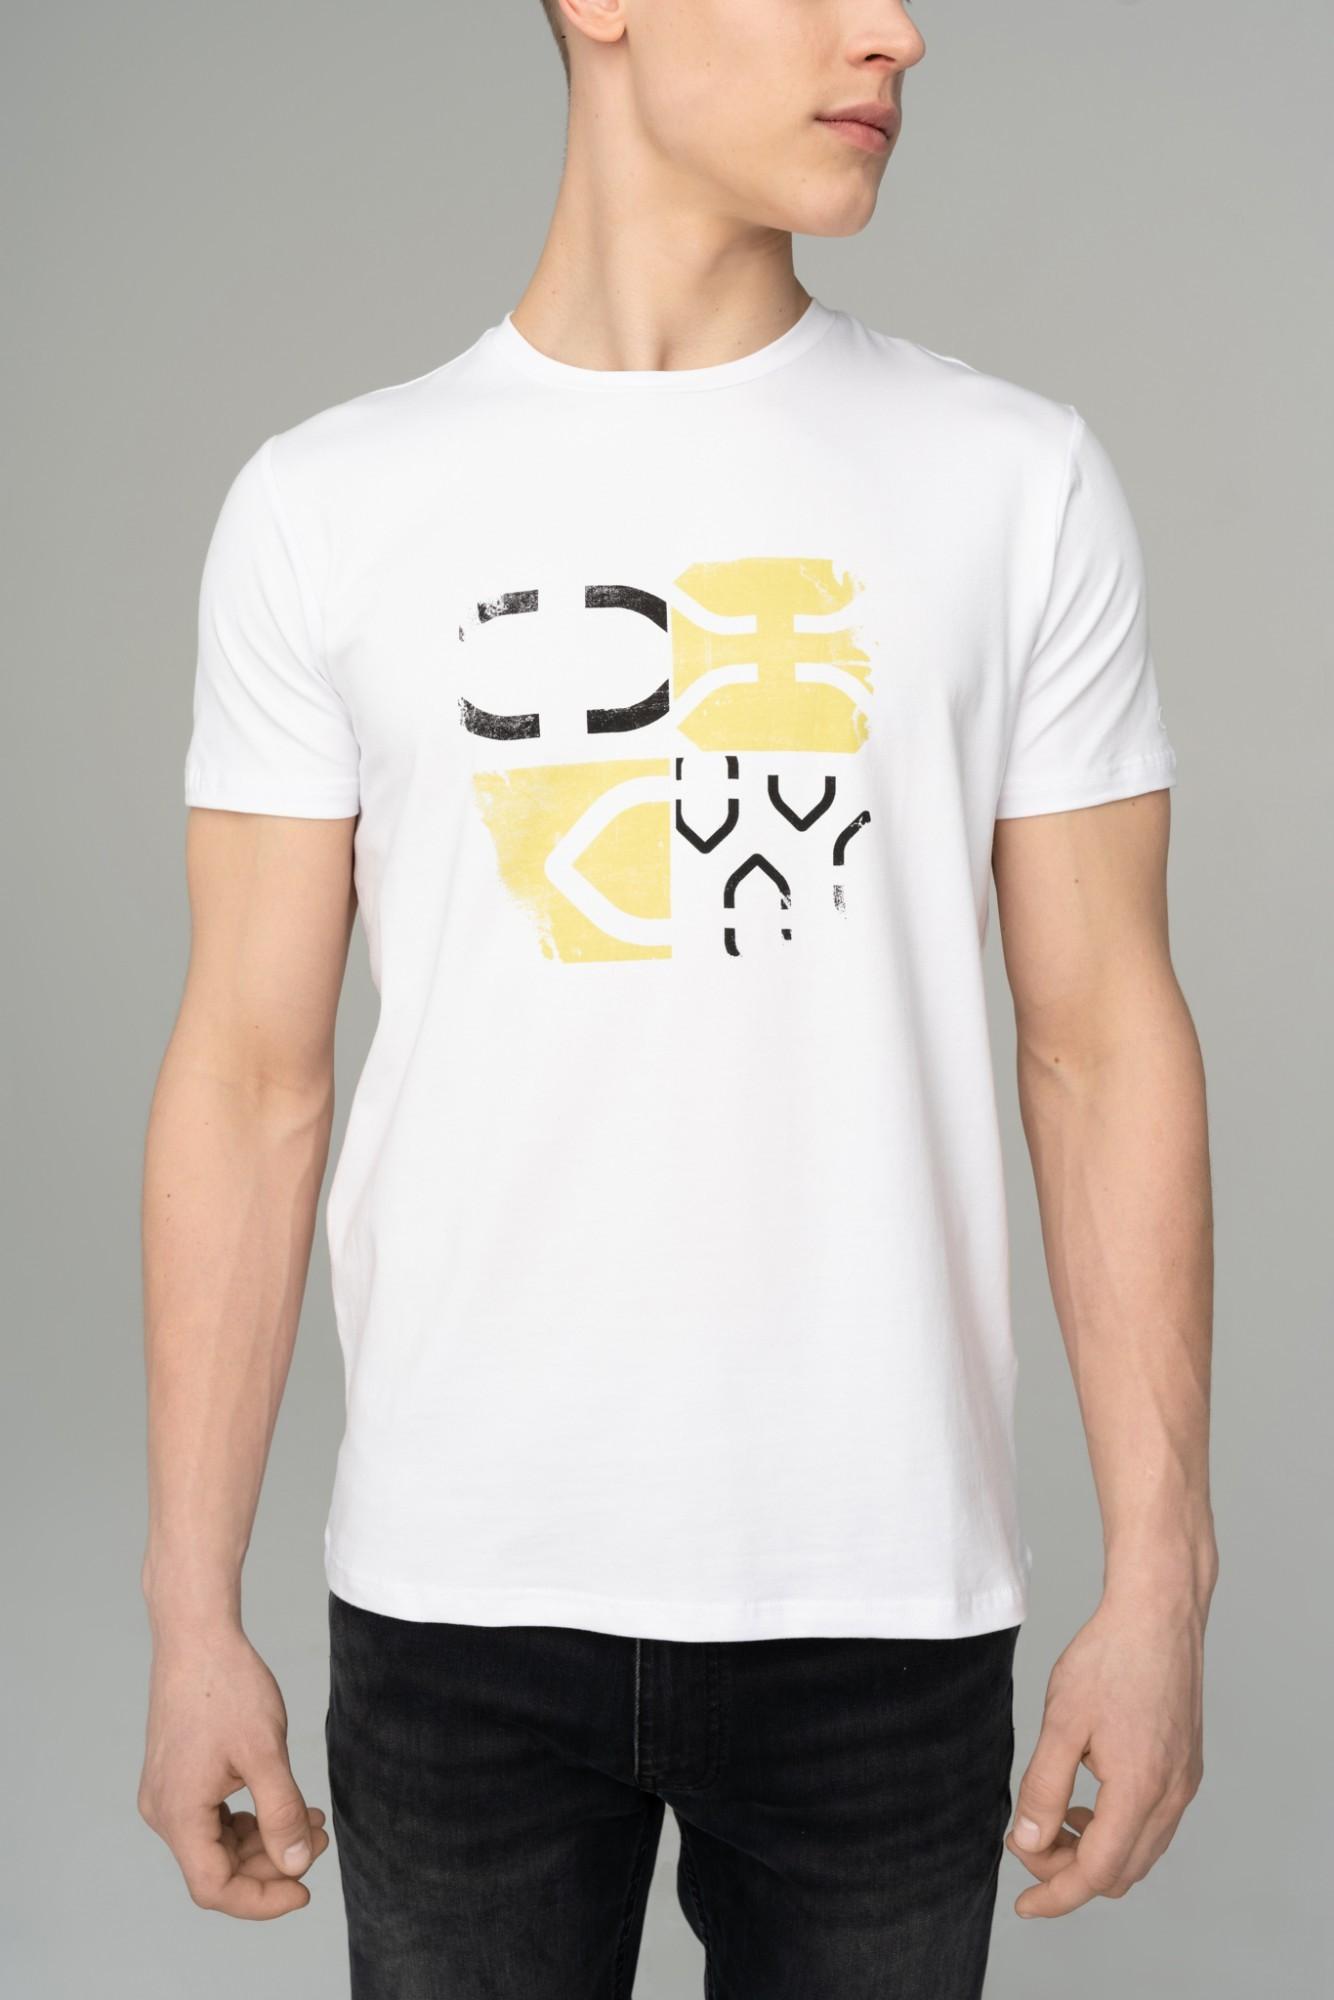 AUDIMAS Margi tamprūs medvilniniai maršk. 2111-476 White Logo Printed L